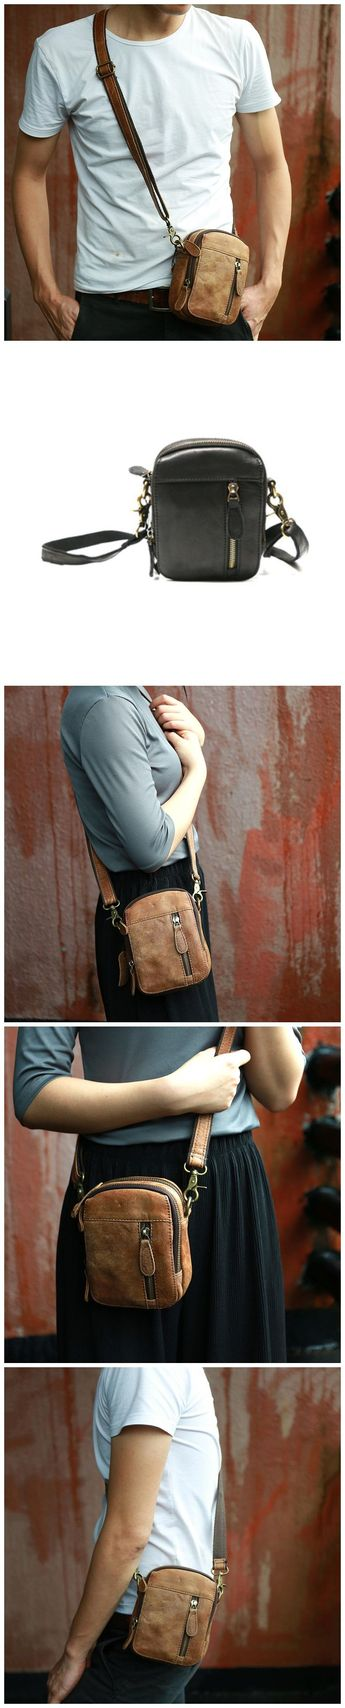 Full Grain Leather Mini Shoulder Bag Casual Crossbody Bag Unisex Waist Bag  Z6807 8caedfad73216